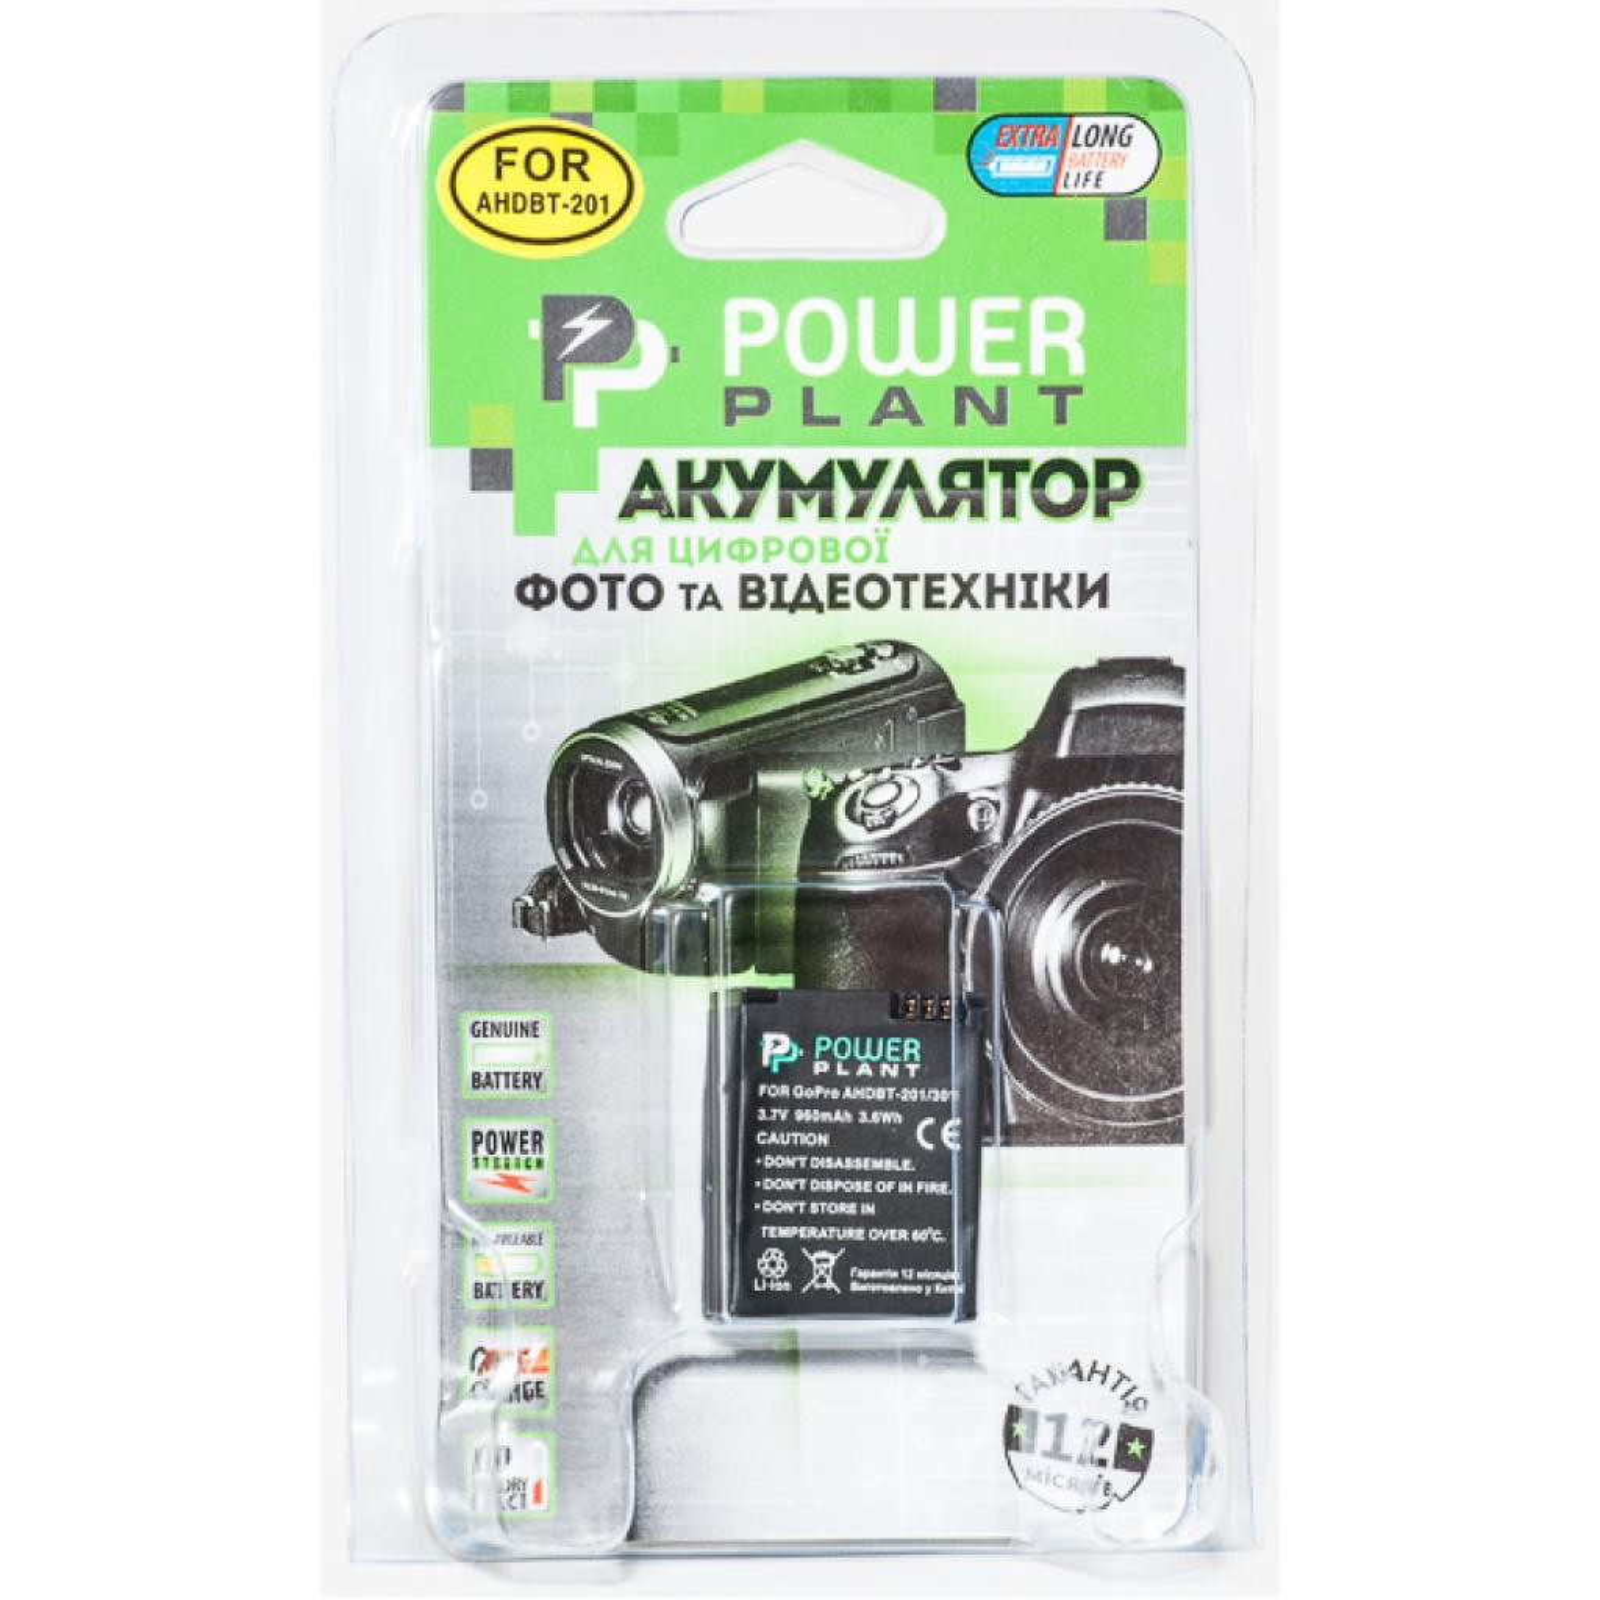 Аккумулятор к фото/видео PowerPlant GoPro Hero 3, AHDBT-201, 301 (DV00DV1357) изображение 3